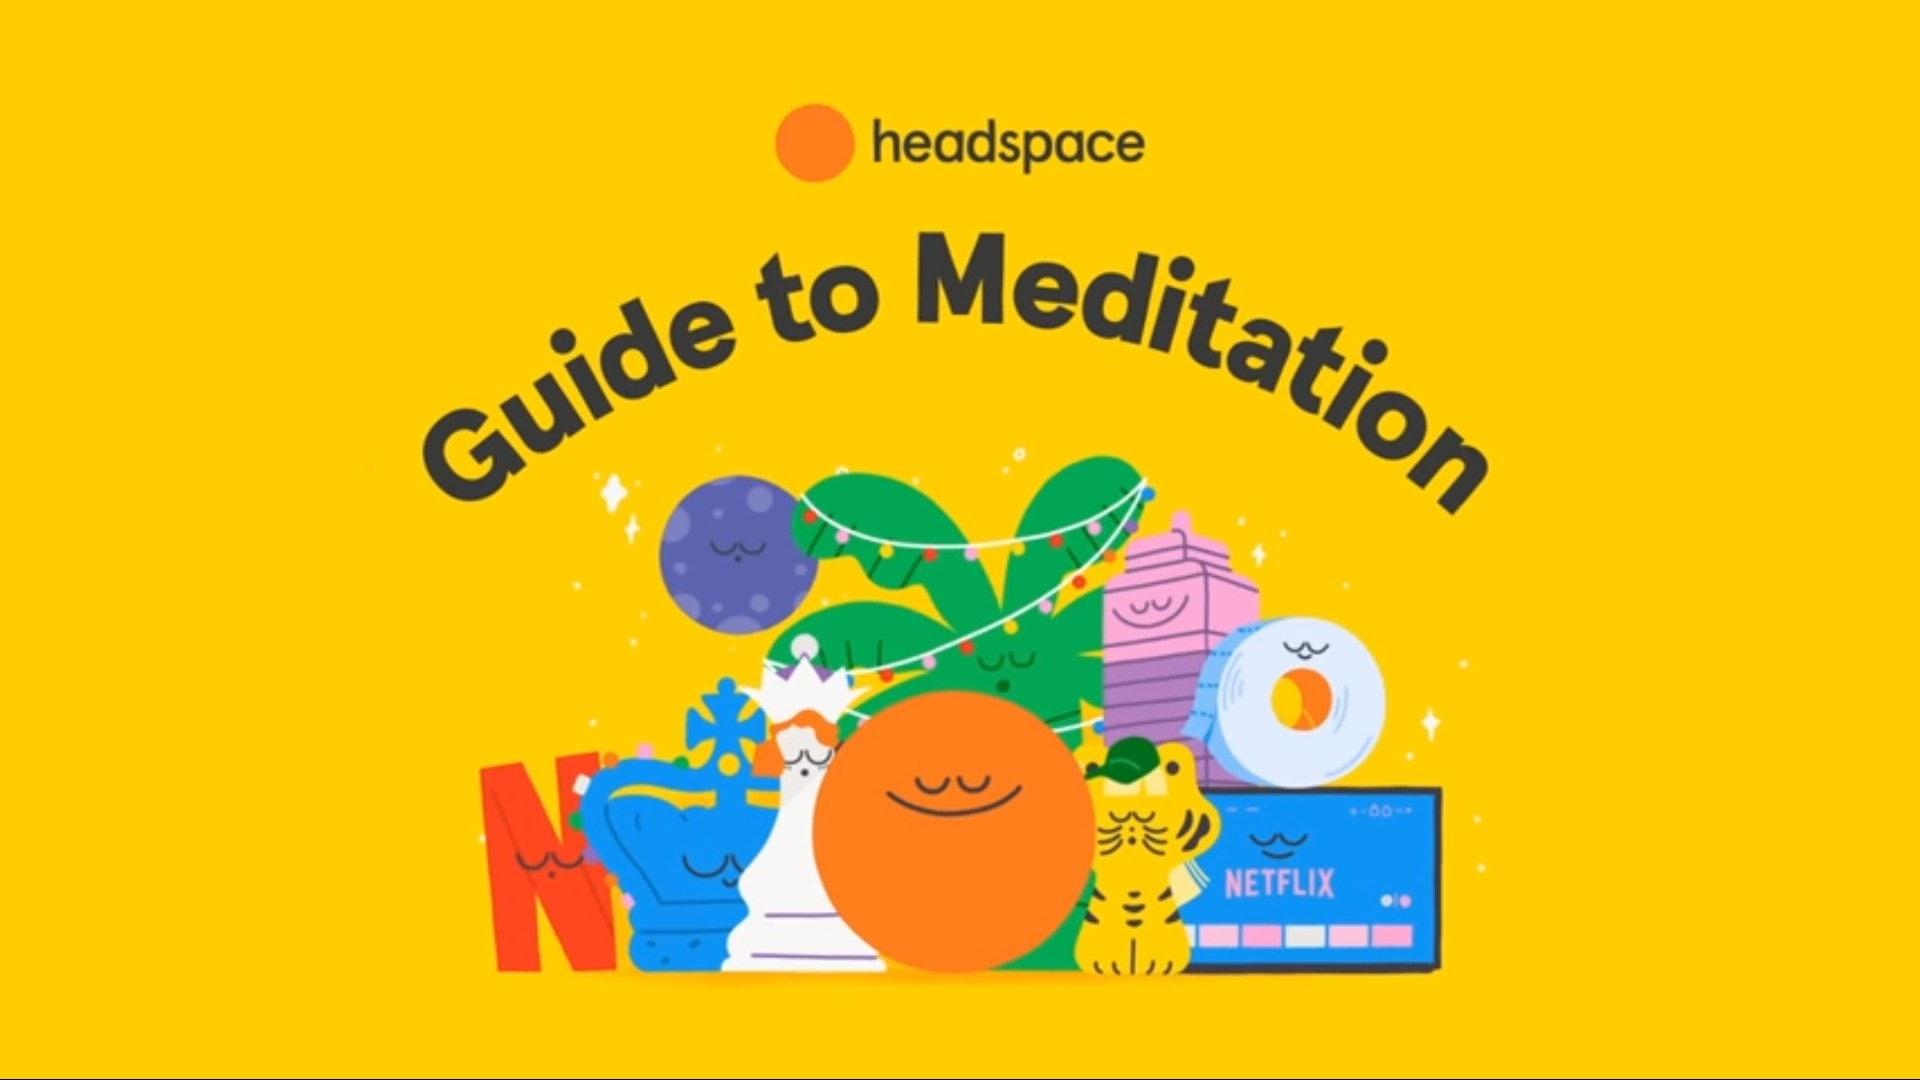 《Headspace 冥想指南》適合大家放鬆心情,以冥想去展開減壓健腦。(影片截圖)